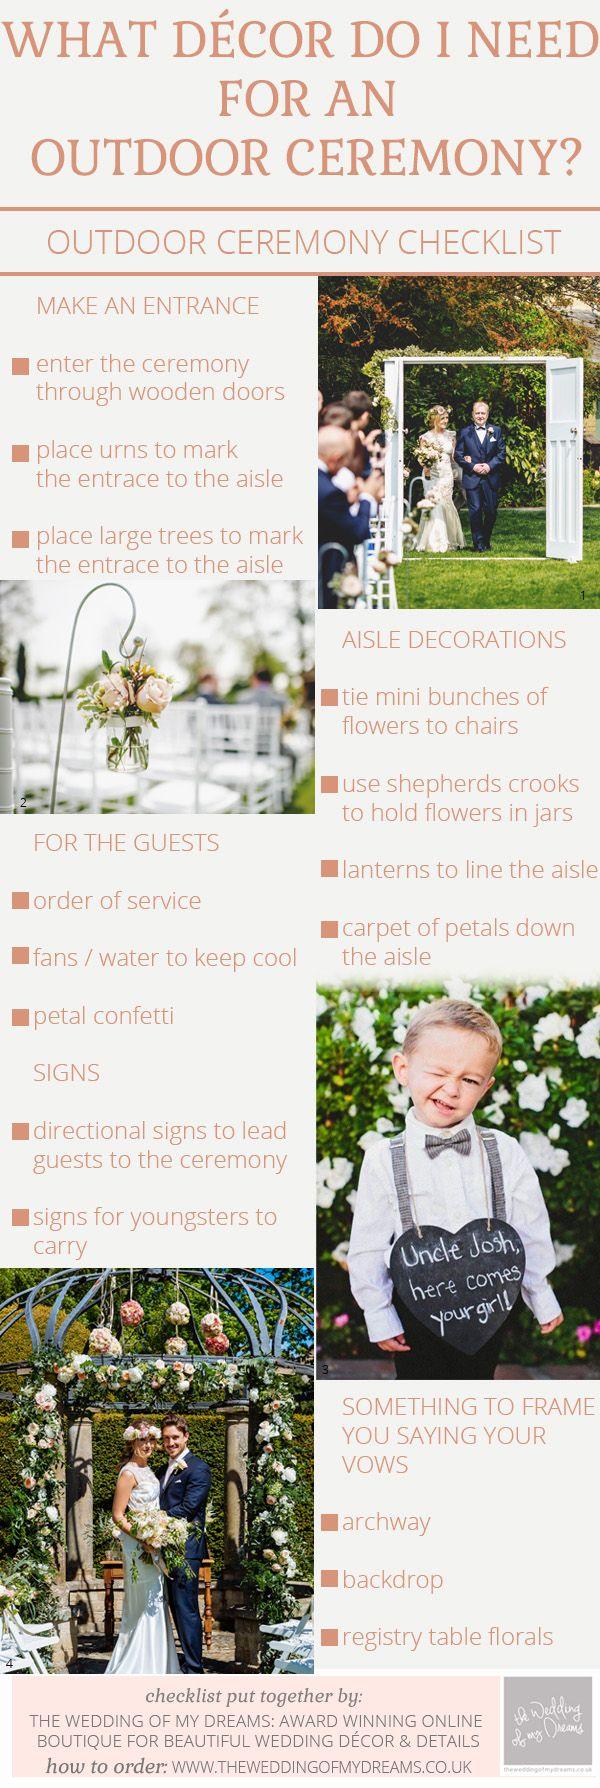 6 wedding checklist templates for rustic beach and outdoor 6 wedding checklist templates for rustic beach and outdoor weddings junglespirit Choice Image